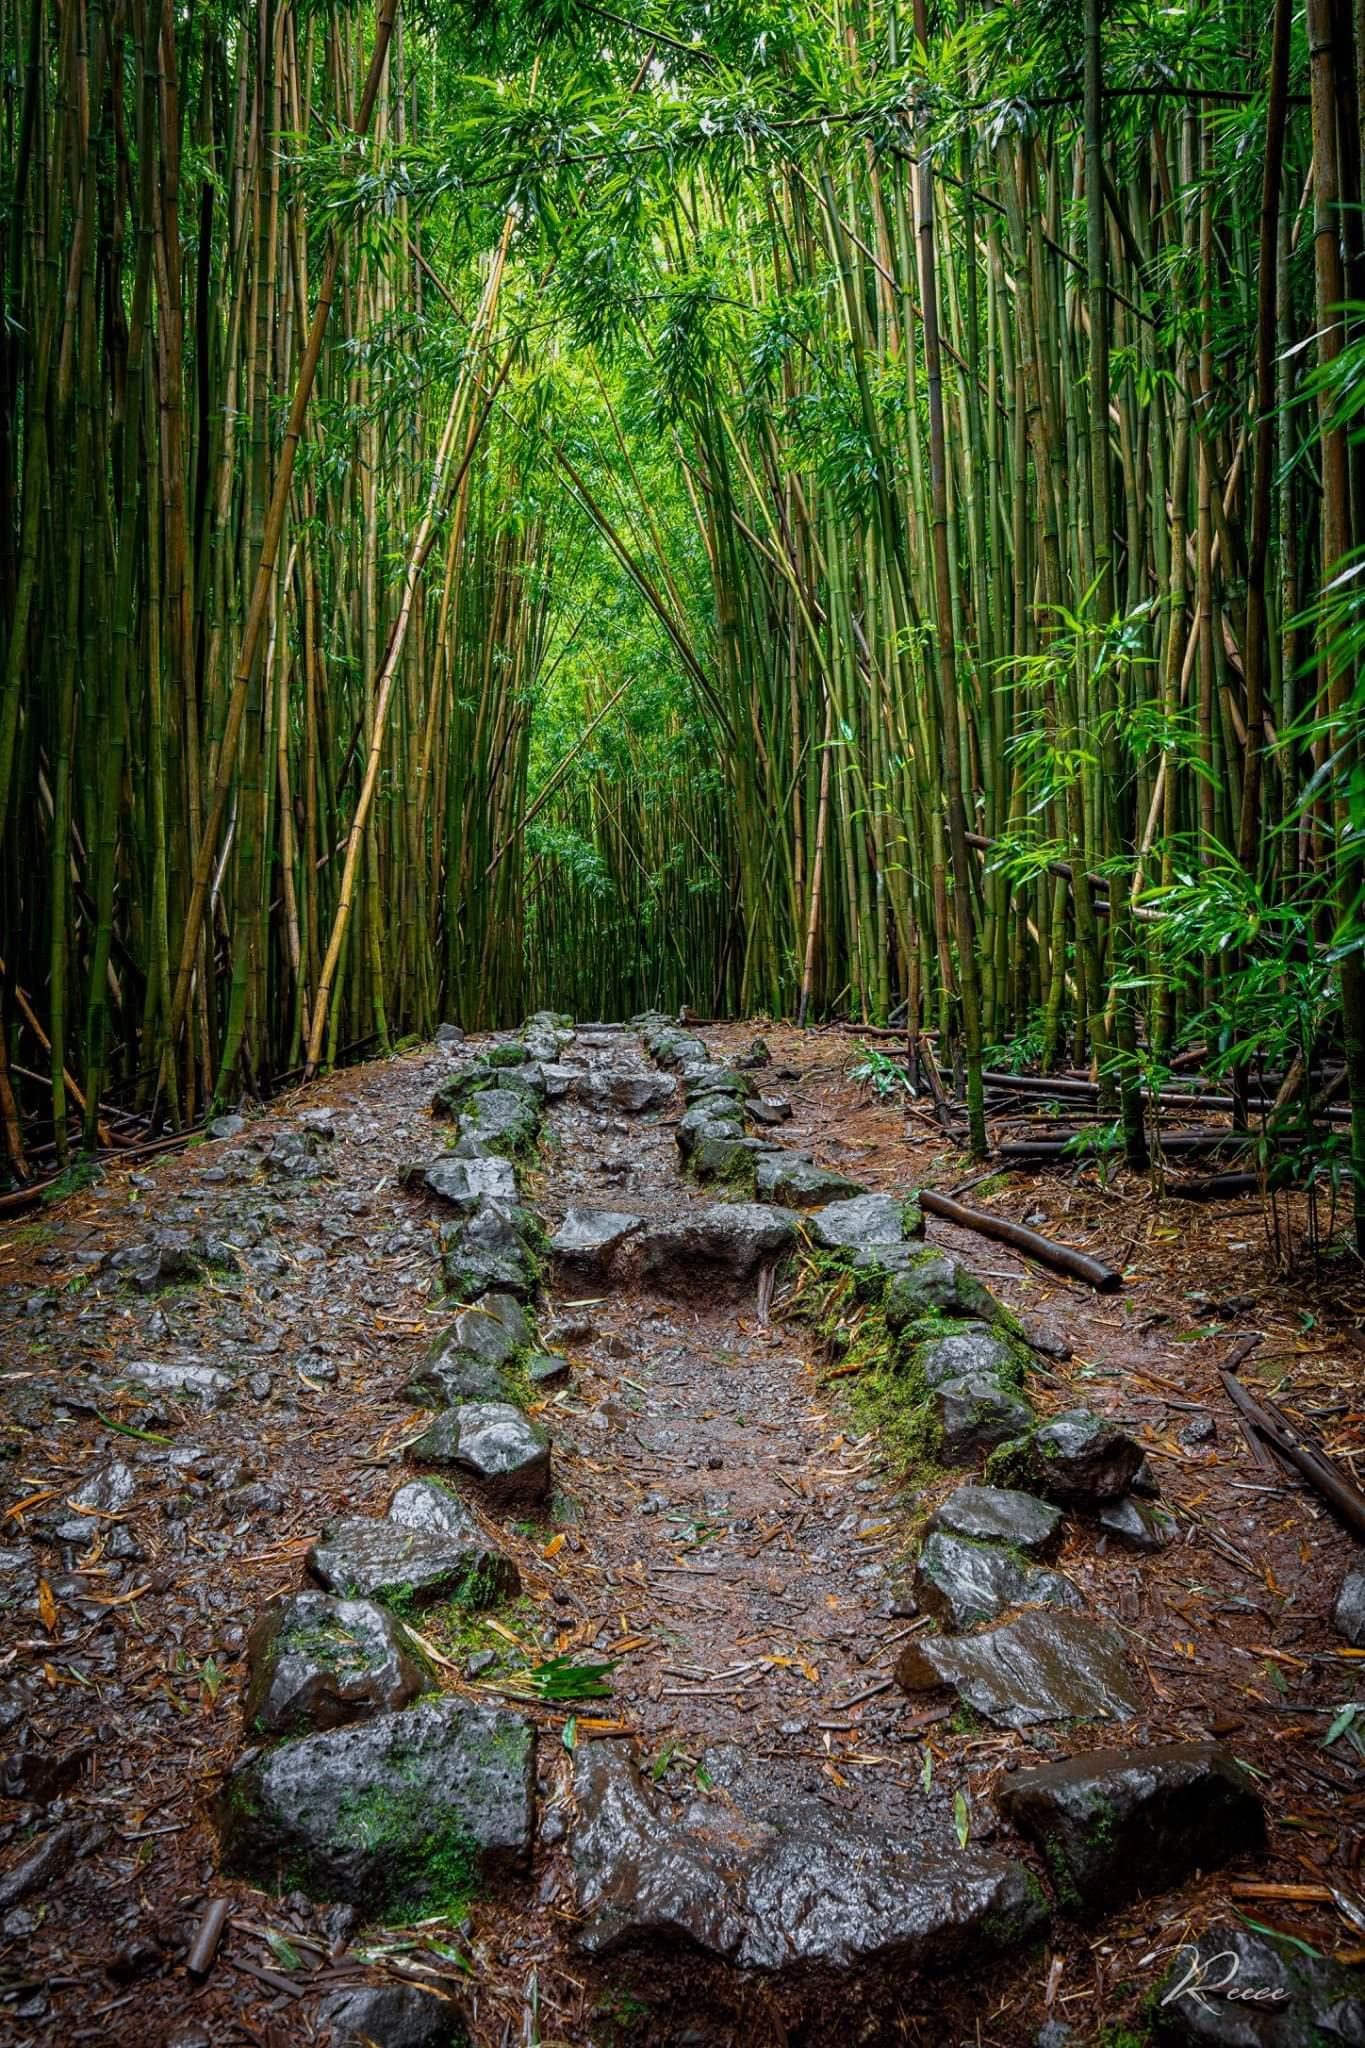 Joe reece   enchanted forest   bamboo forest landscape luxury photography road to hana curvy hiking trails adventure green evo art maui front street lahaina gallery hawaii xf0fat